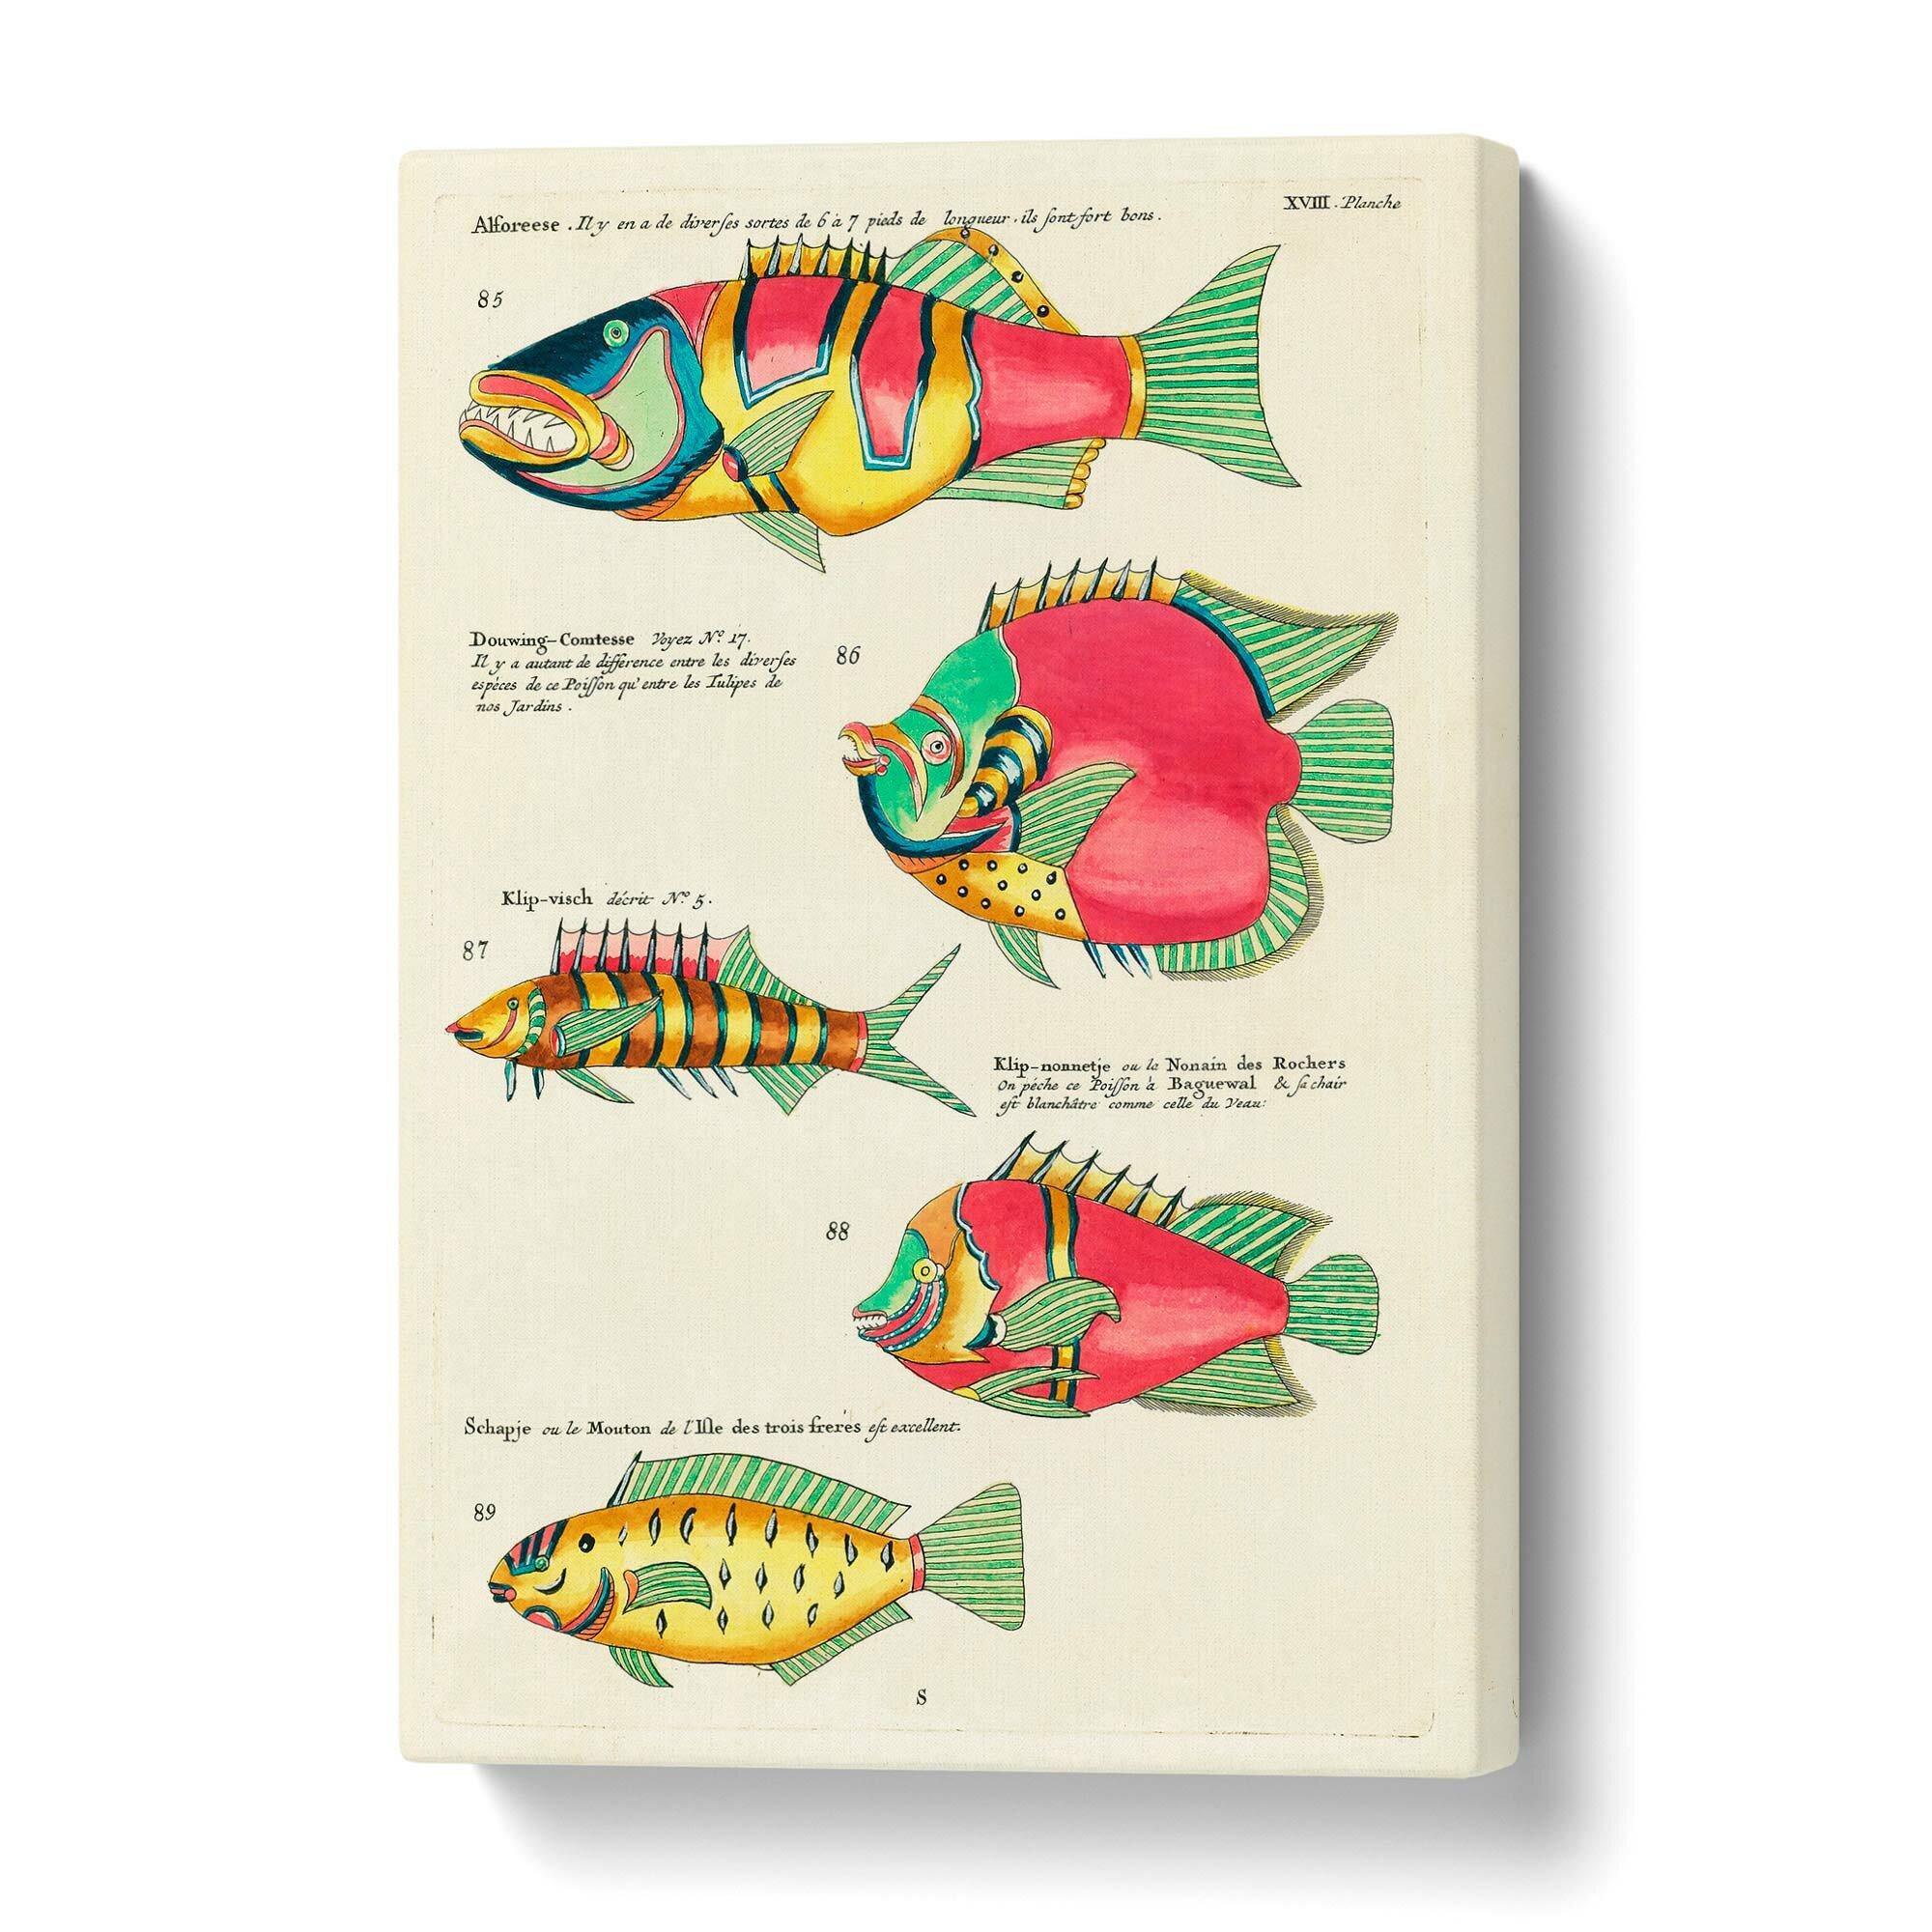 Leinwandbild East Indies Fish Illustrations XVIII by Louis Renard